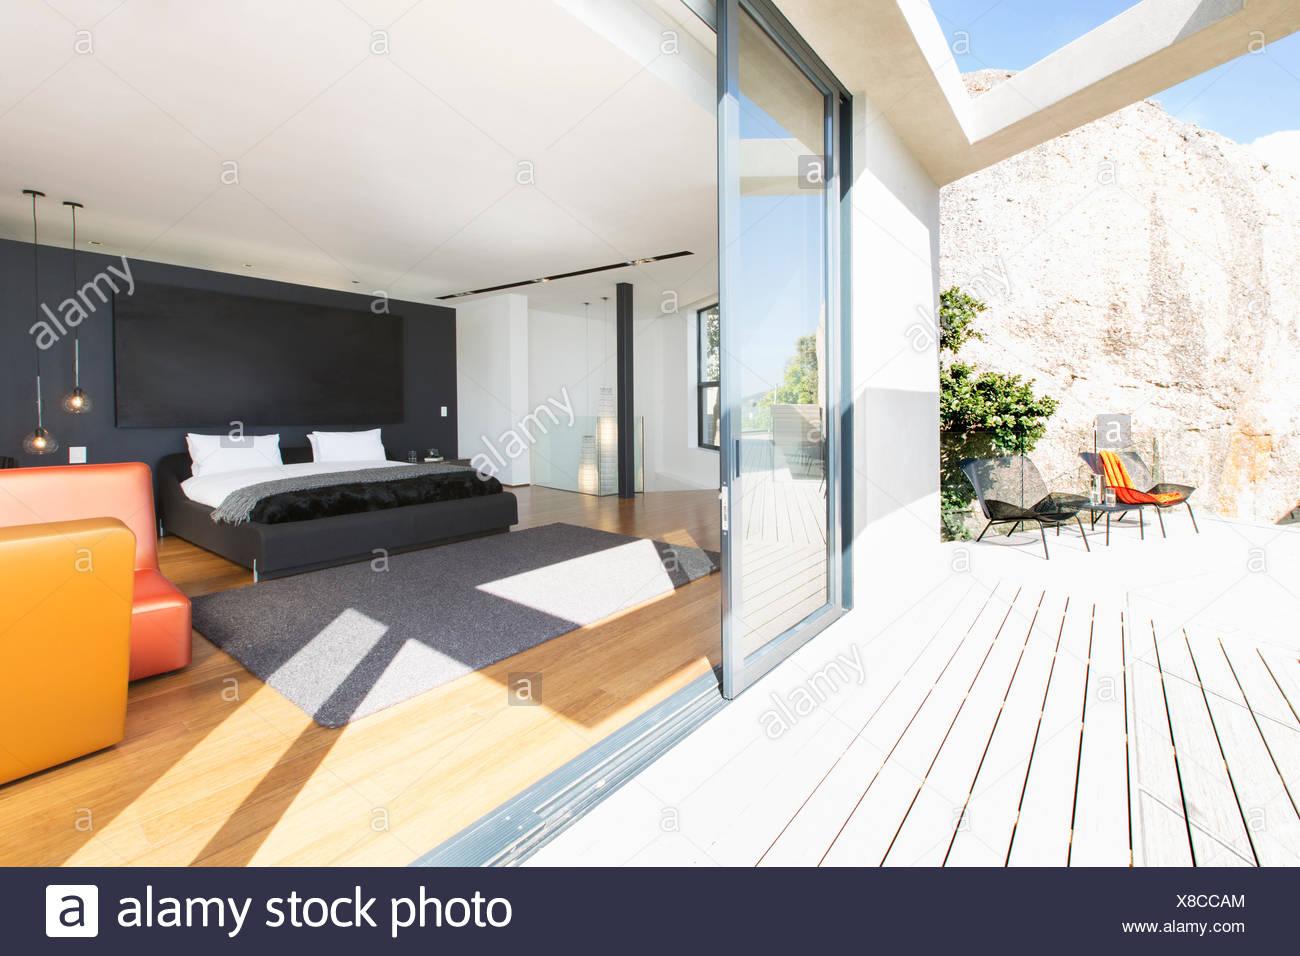 Sliding Glass Door Onto Bedroom In Modern House Stock Photo